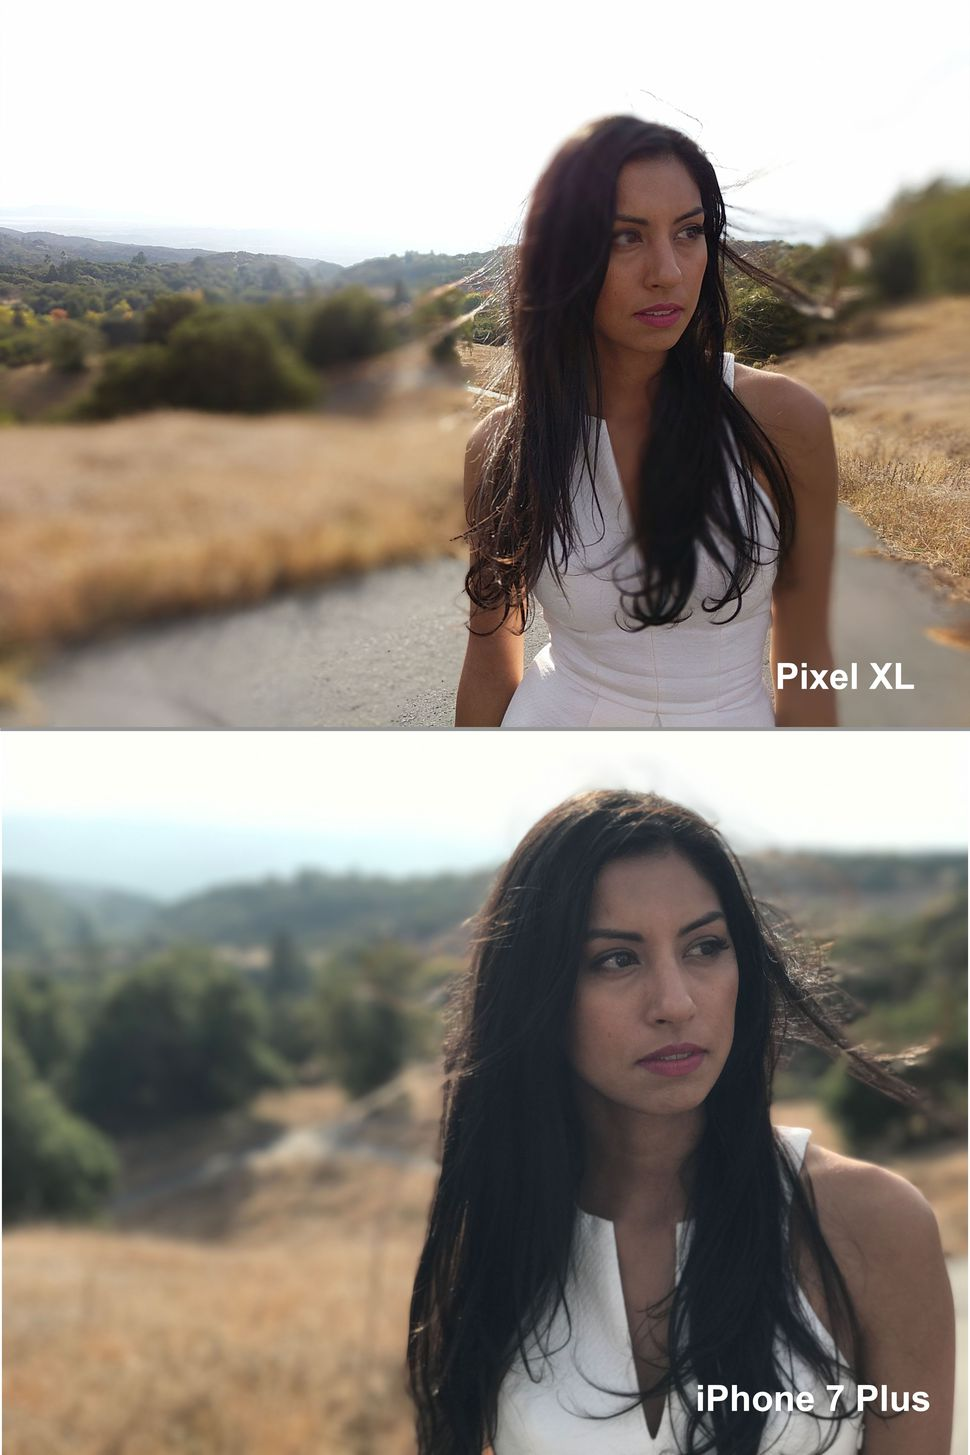 pixel-xl-vs-iphone-7-plus